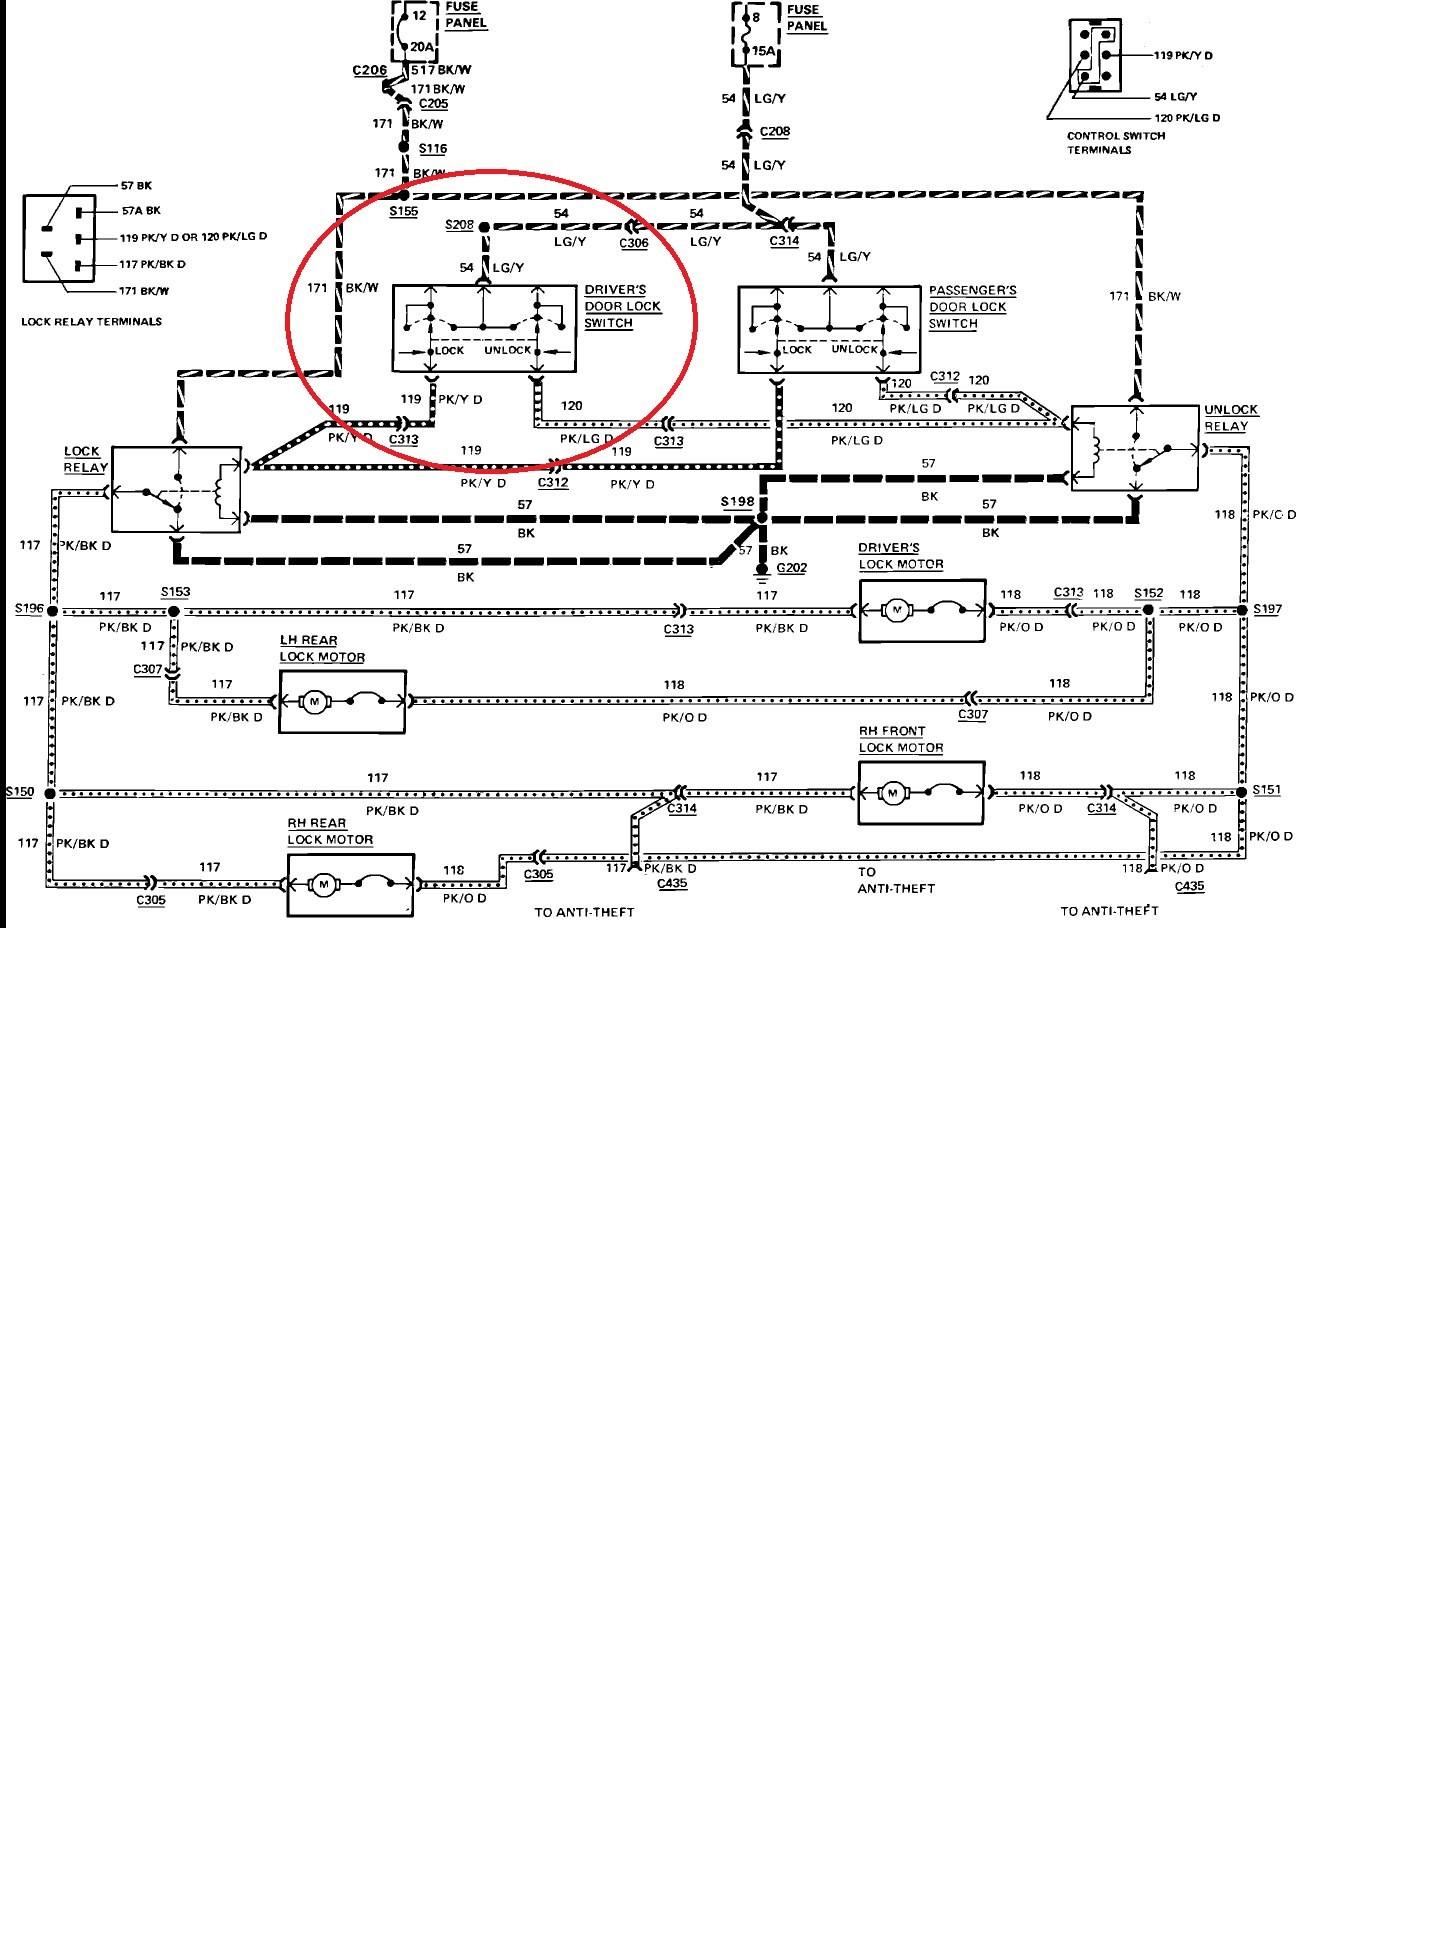 2000 audi a4 fuse box diagram